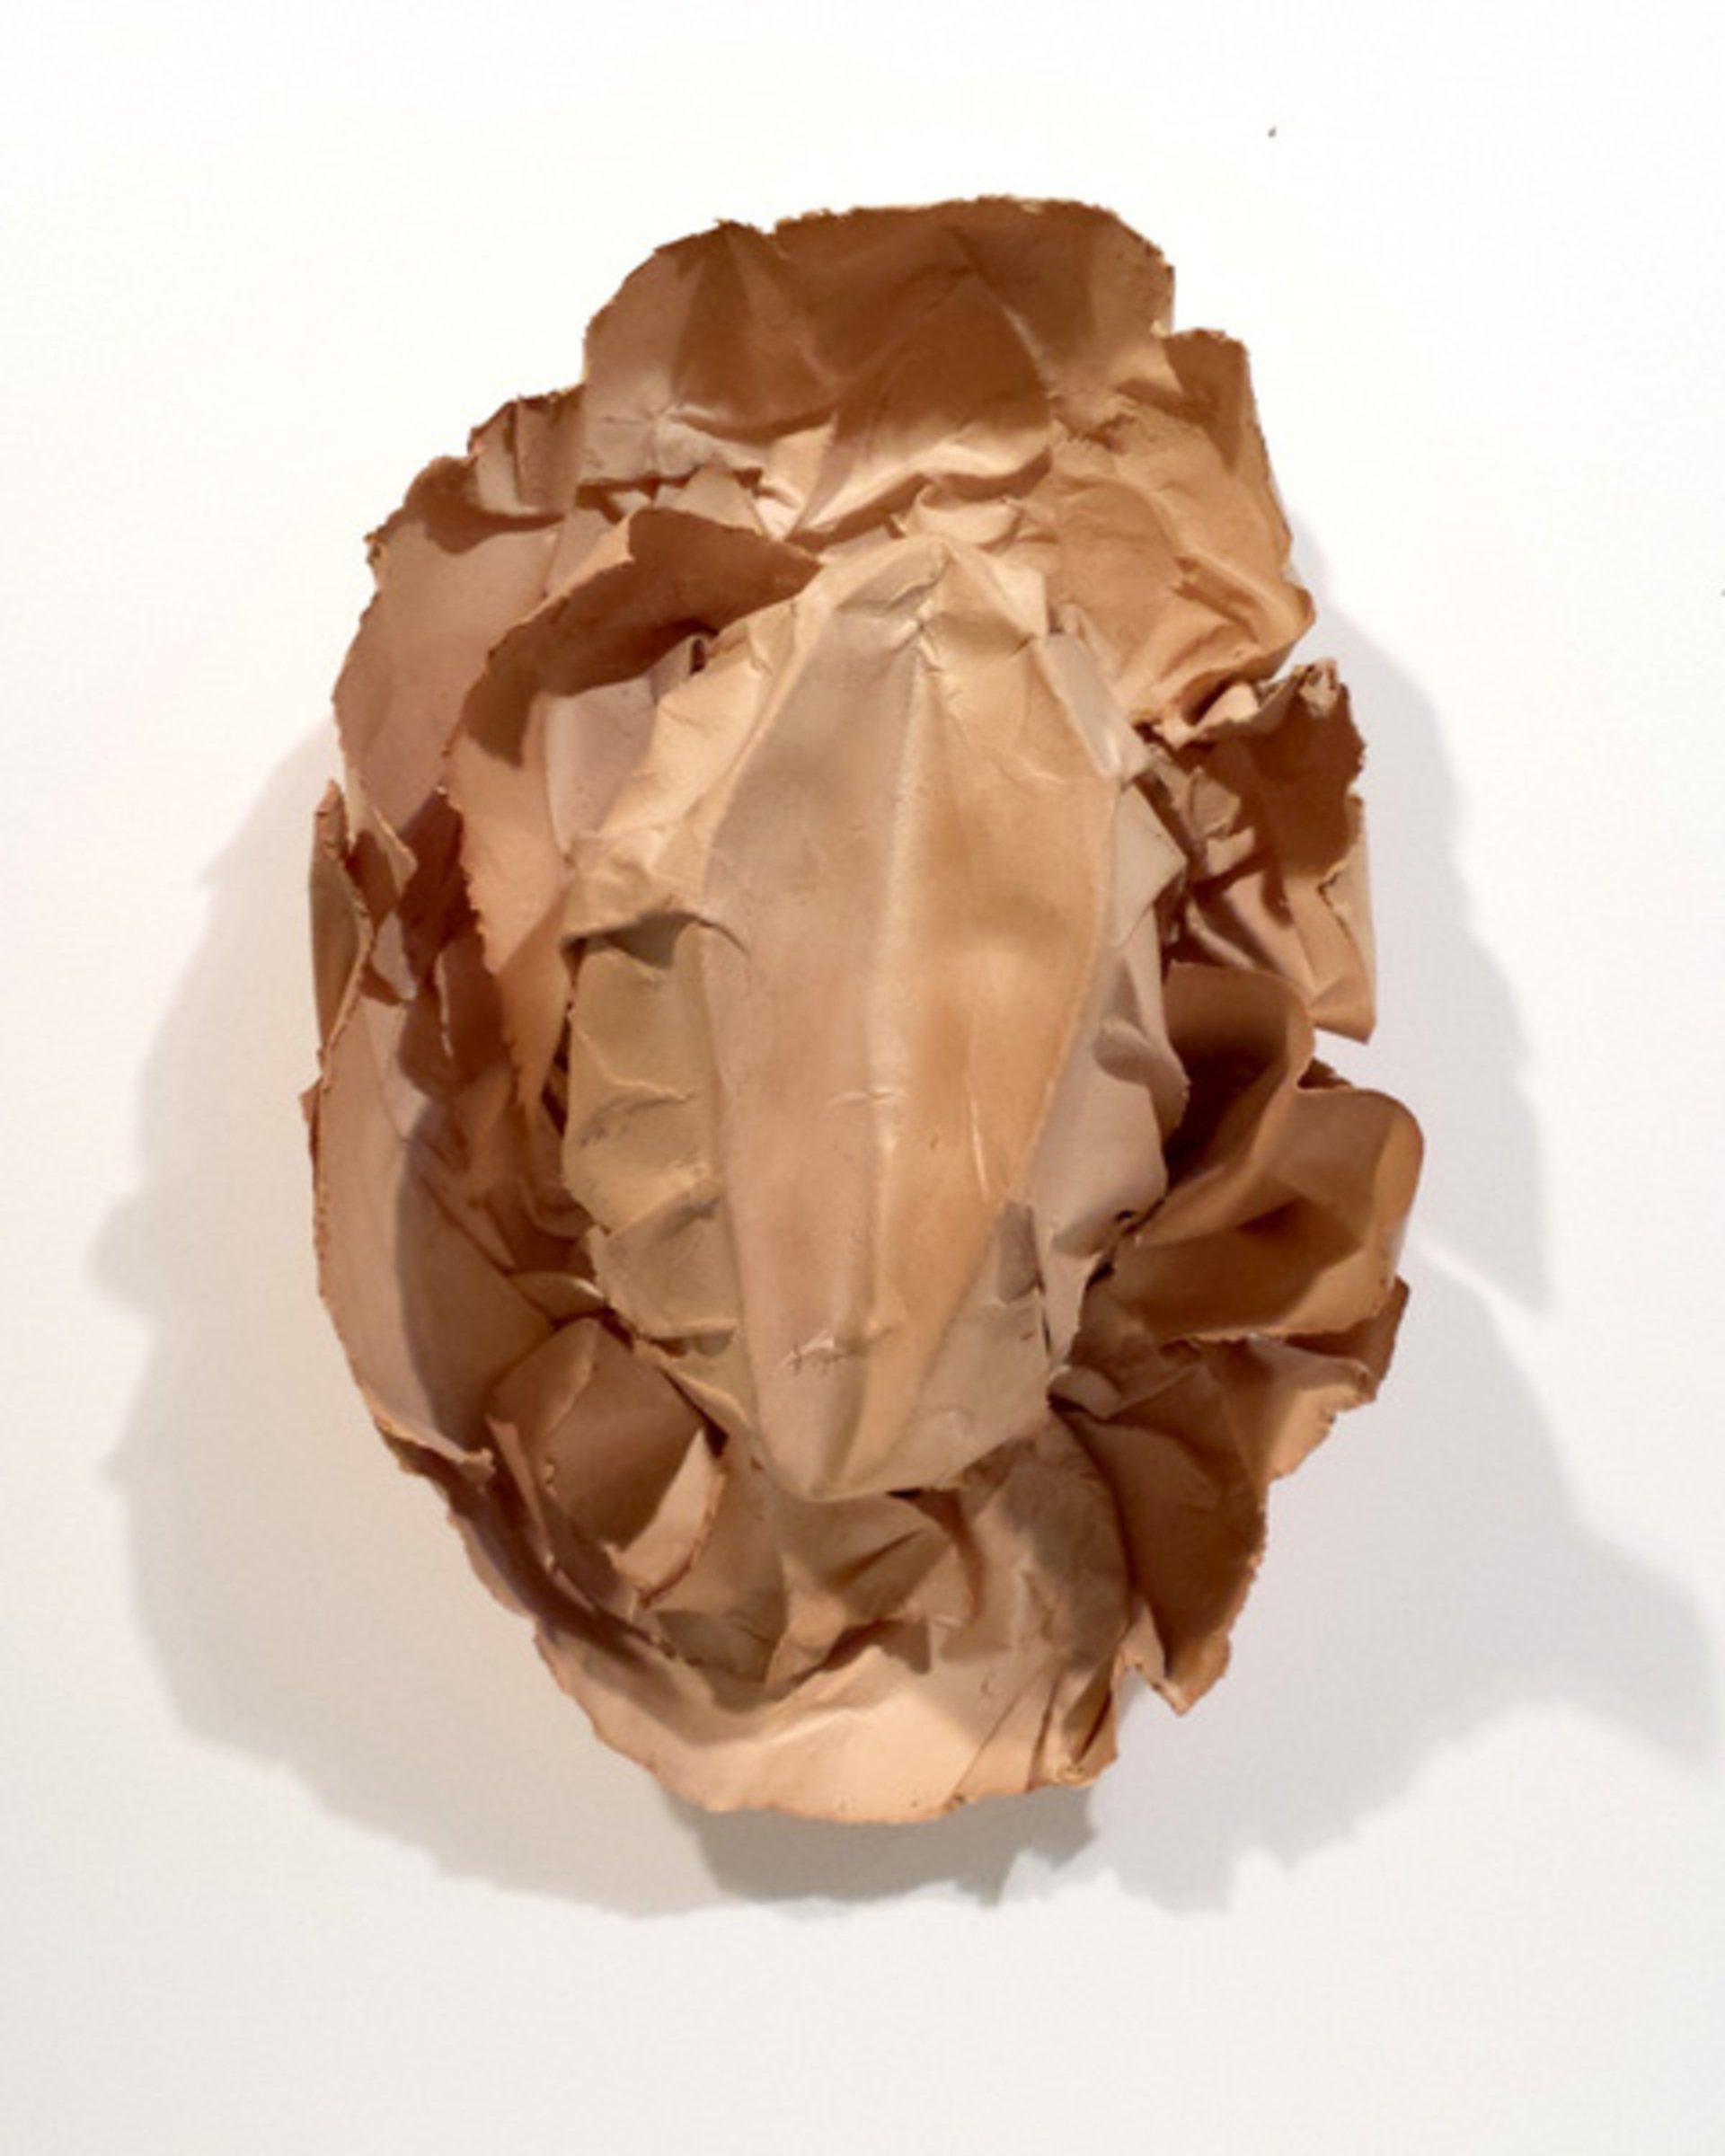 Duane Zaloudek, #18, 1982